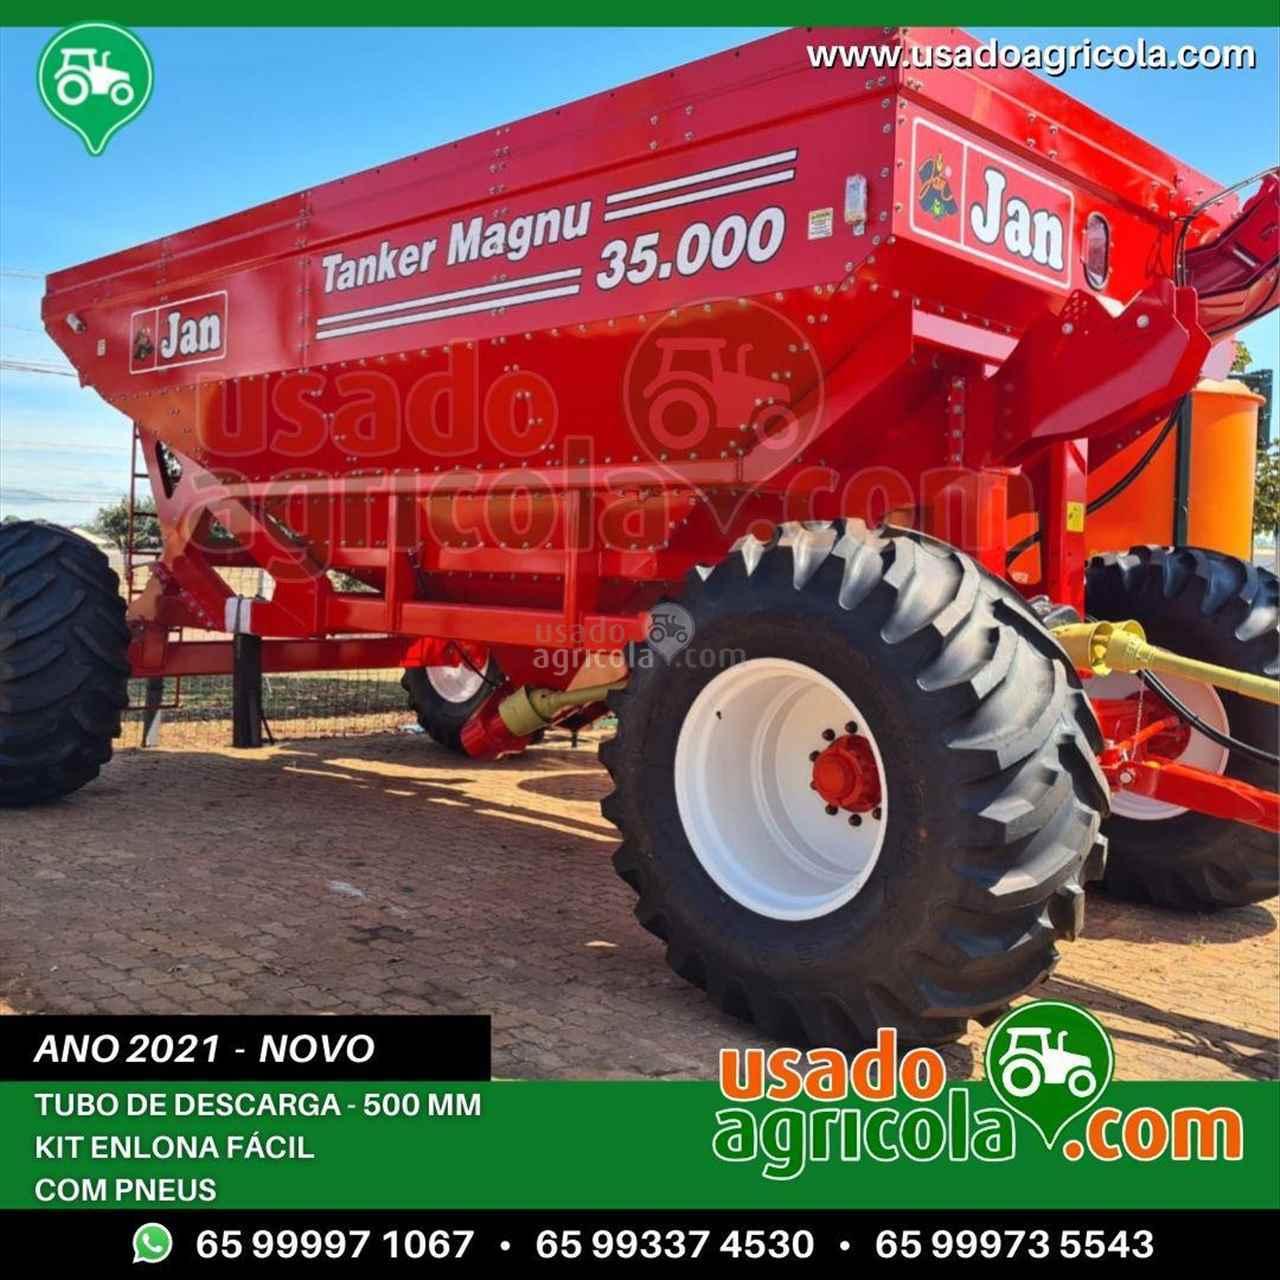 GRANELEIRA 34000 de Usado Agrícola - LUCAS DO RIO VERDE/MT